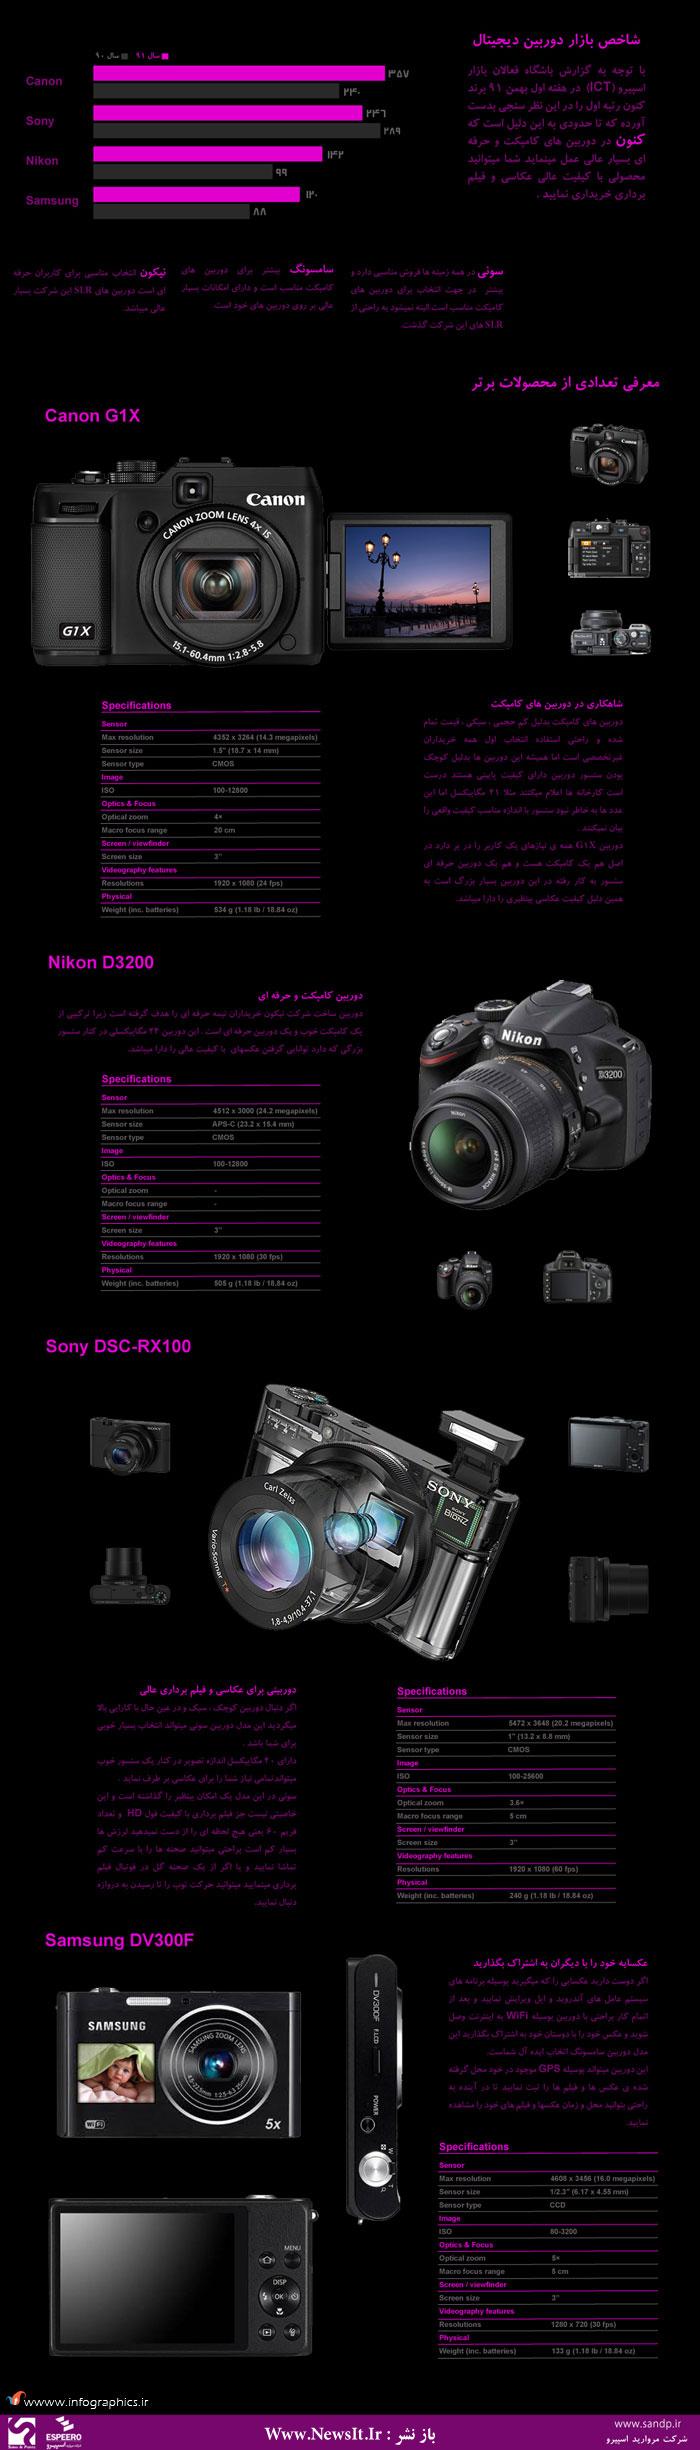 digital-camera-infographic-